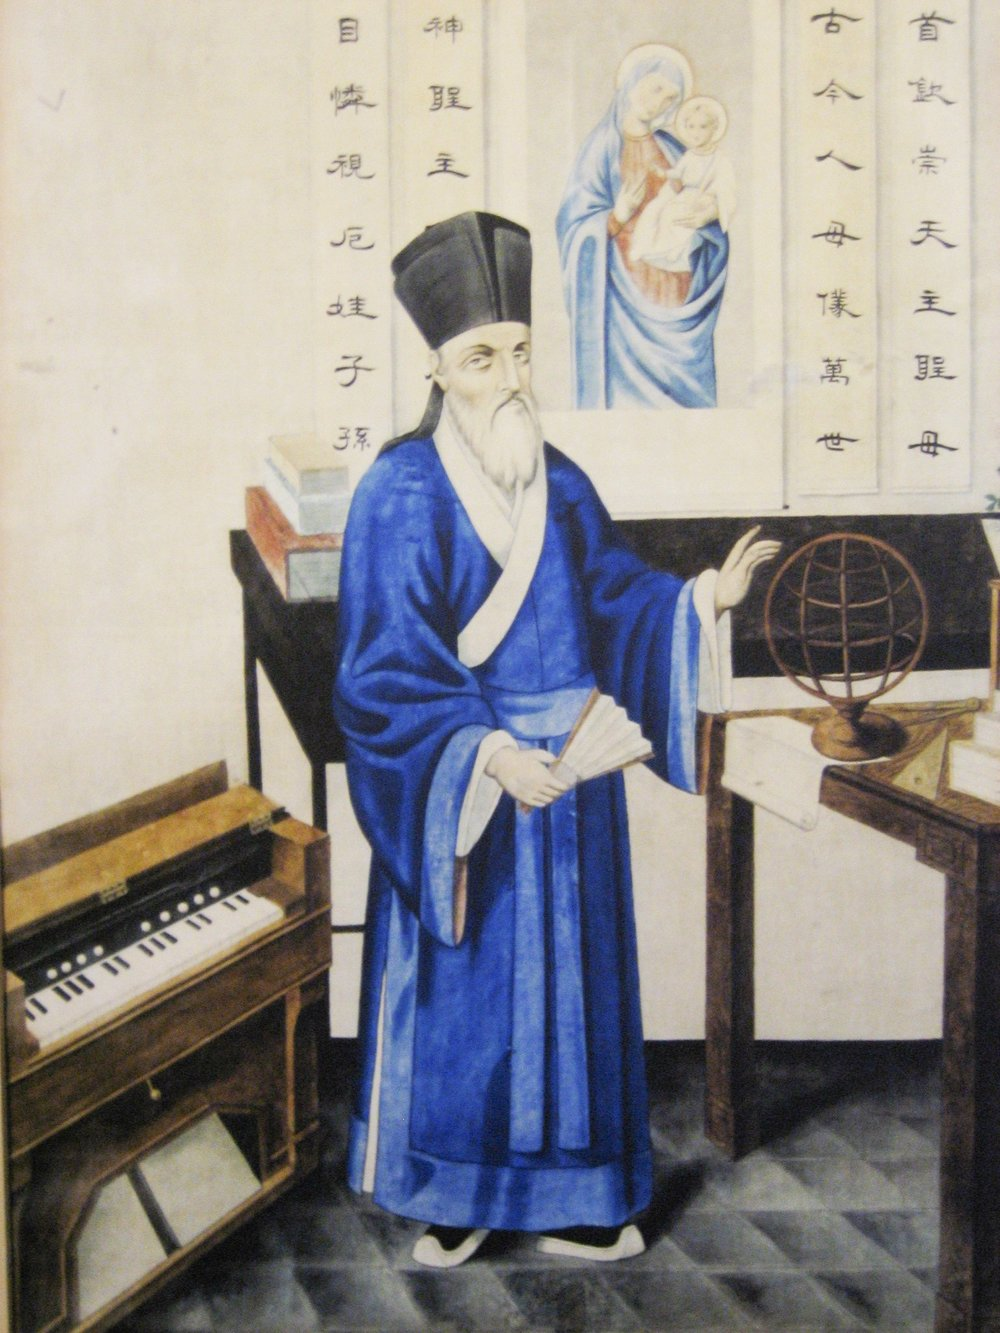 Father Matteo Ricci - Italian Jesuit Priest and Missionary. [Public Domain]